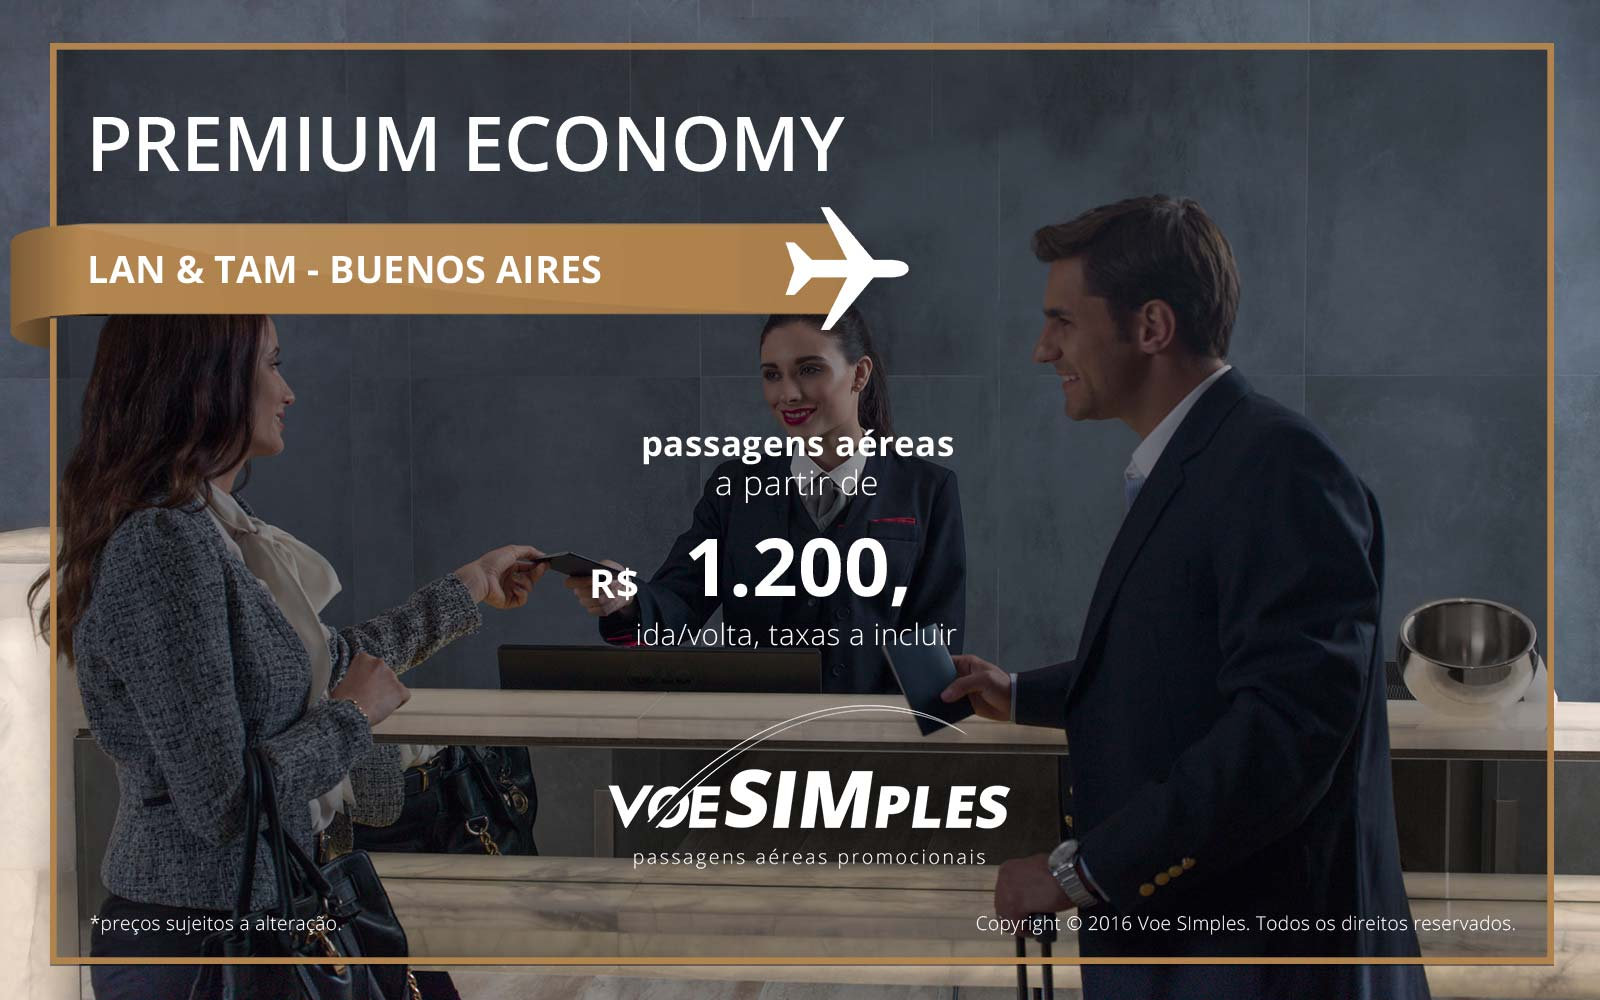 Passagem aérea Premium Economy TAM e LAN para Buenos Aires